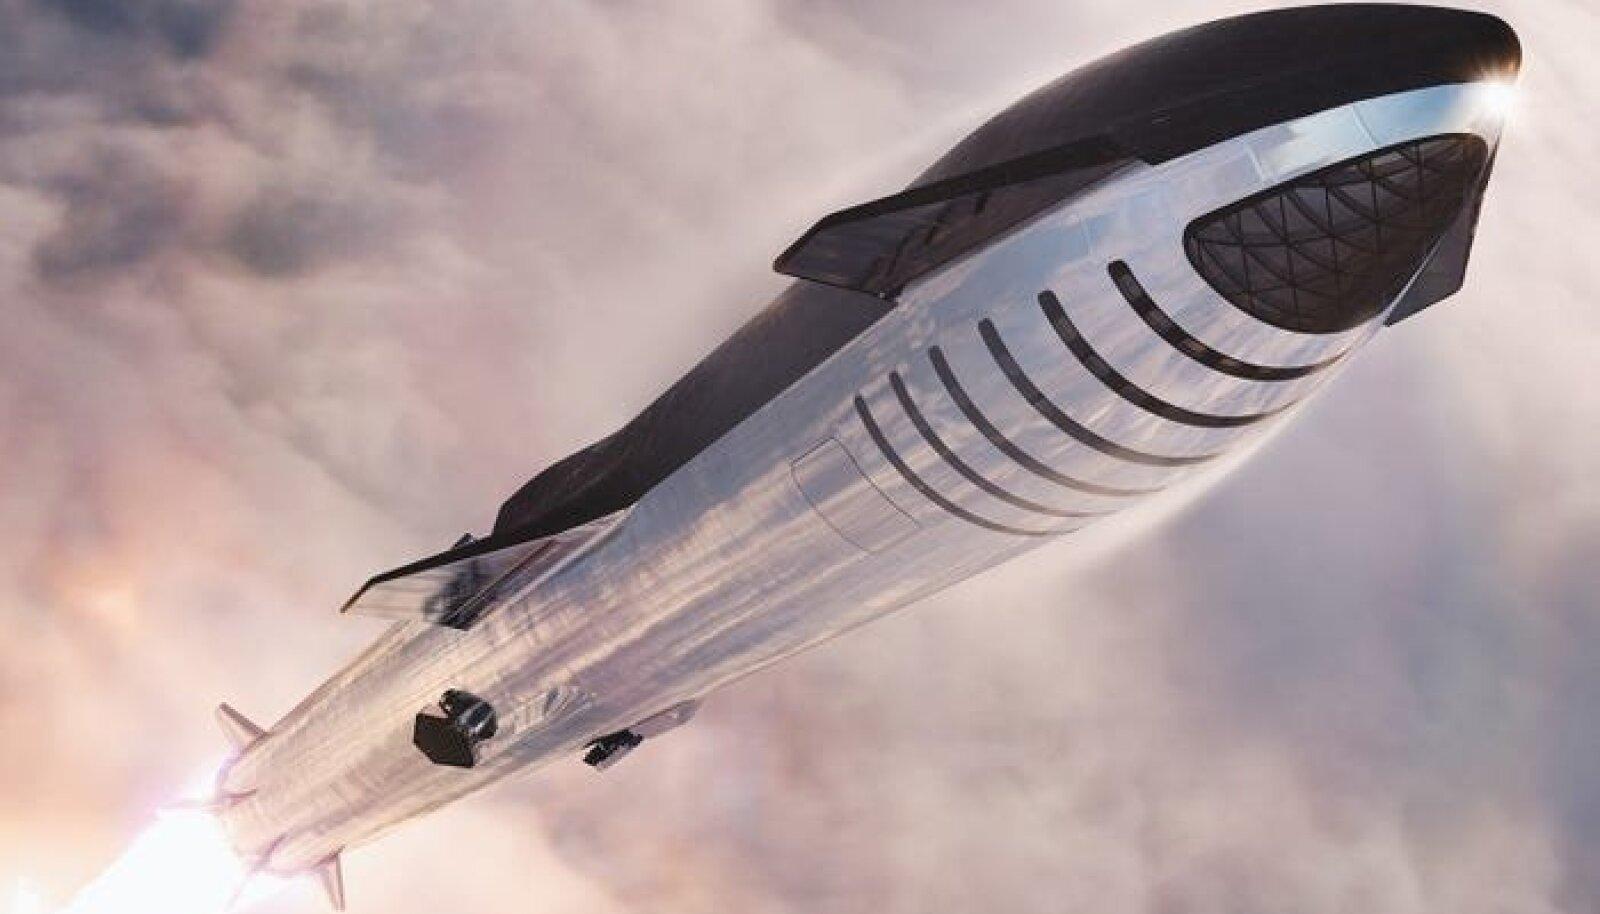 Starship (foto: SpaceX)